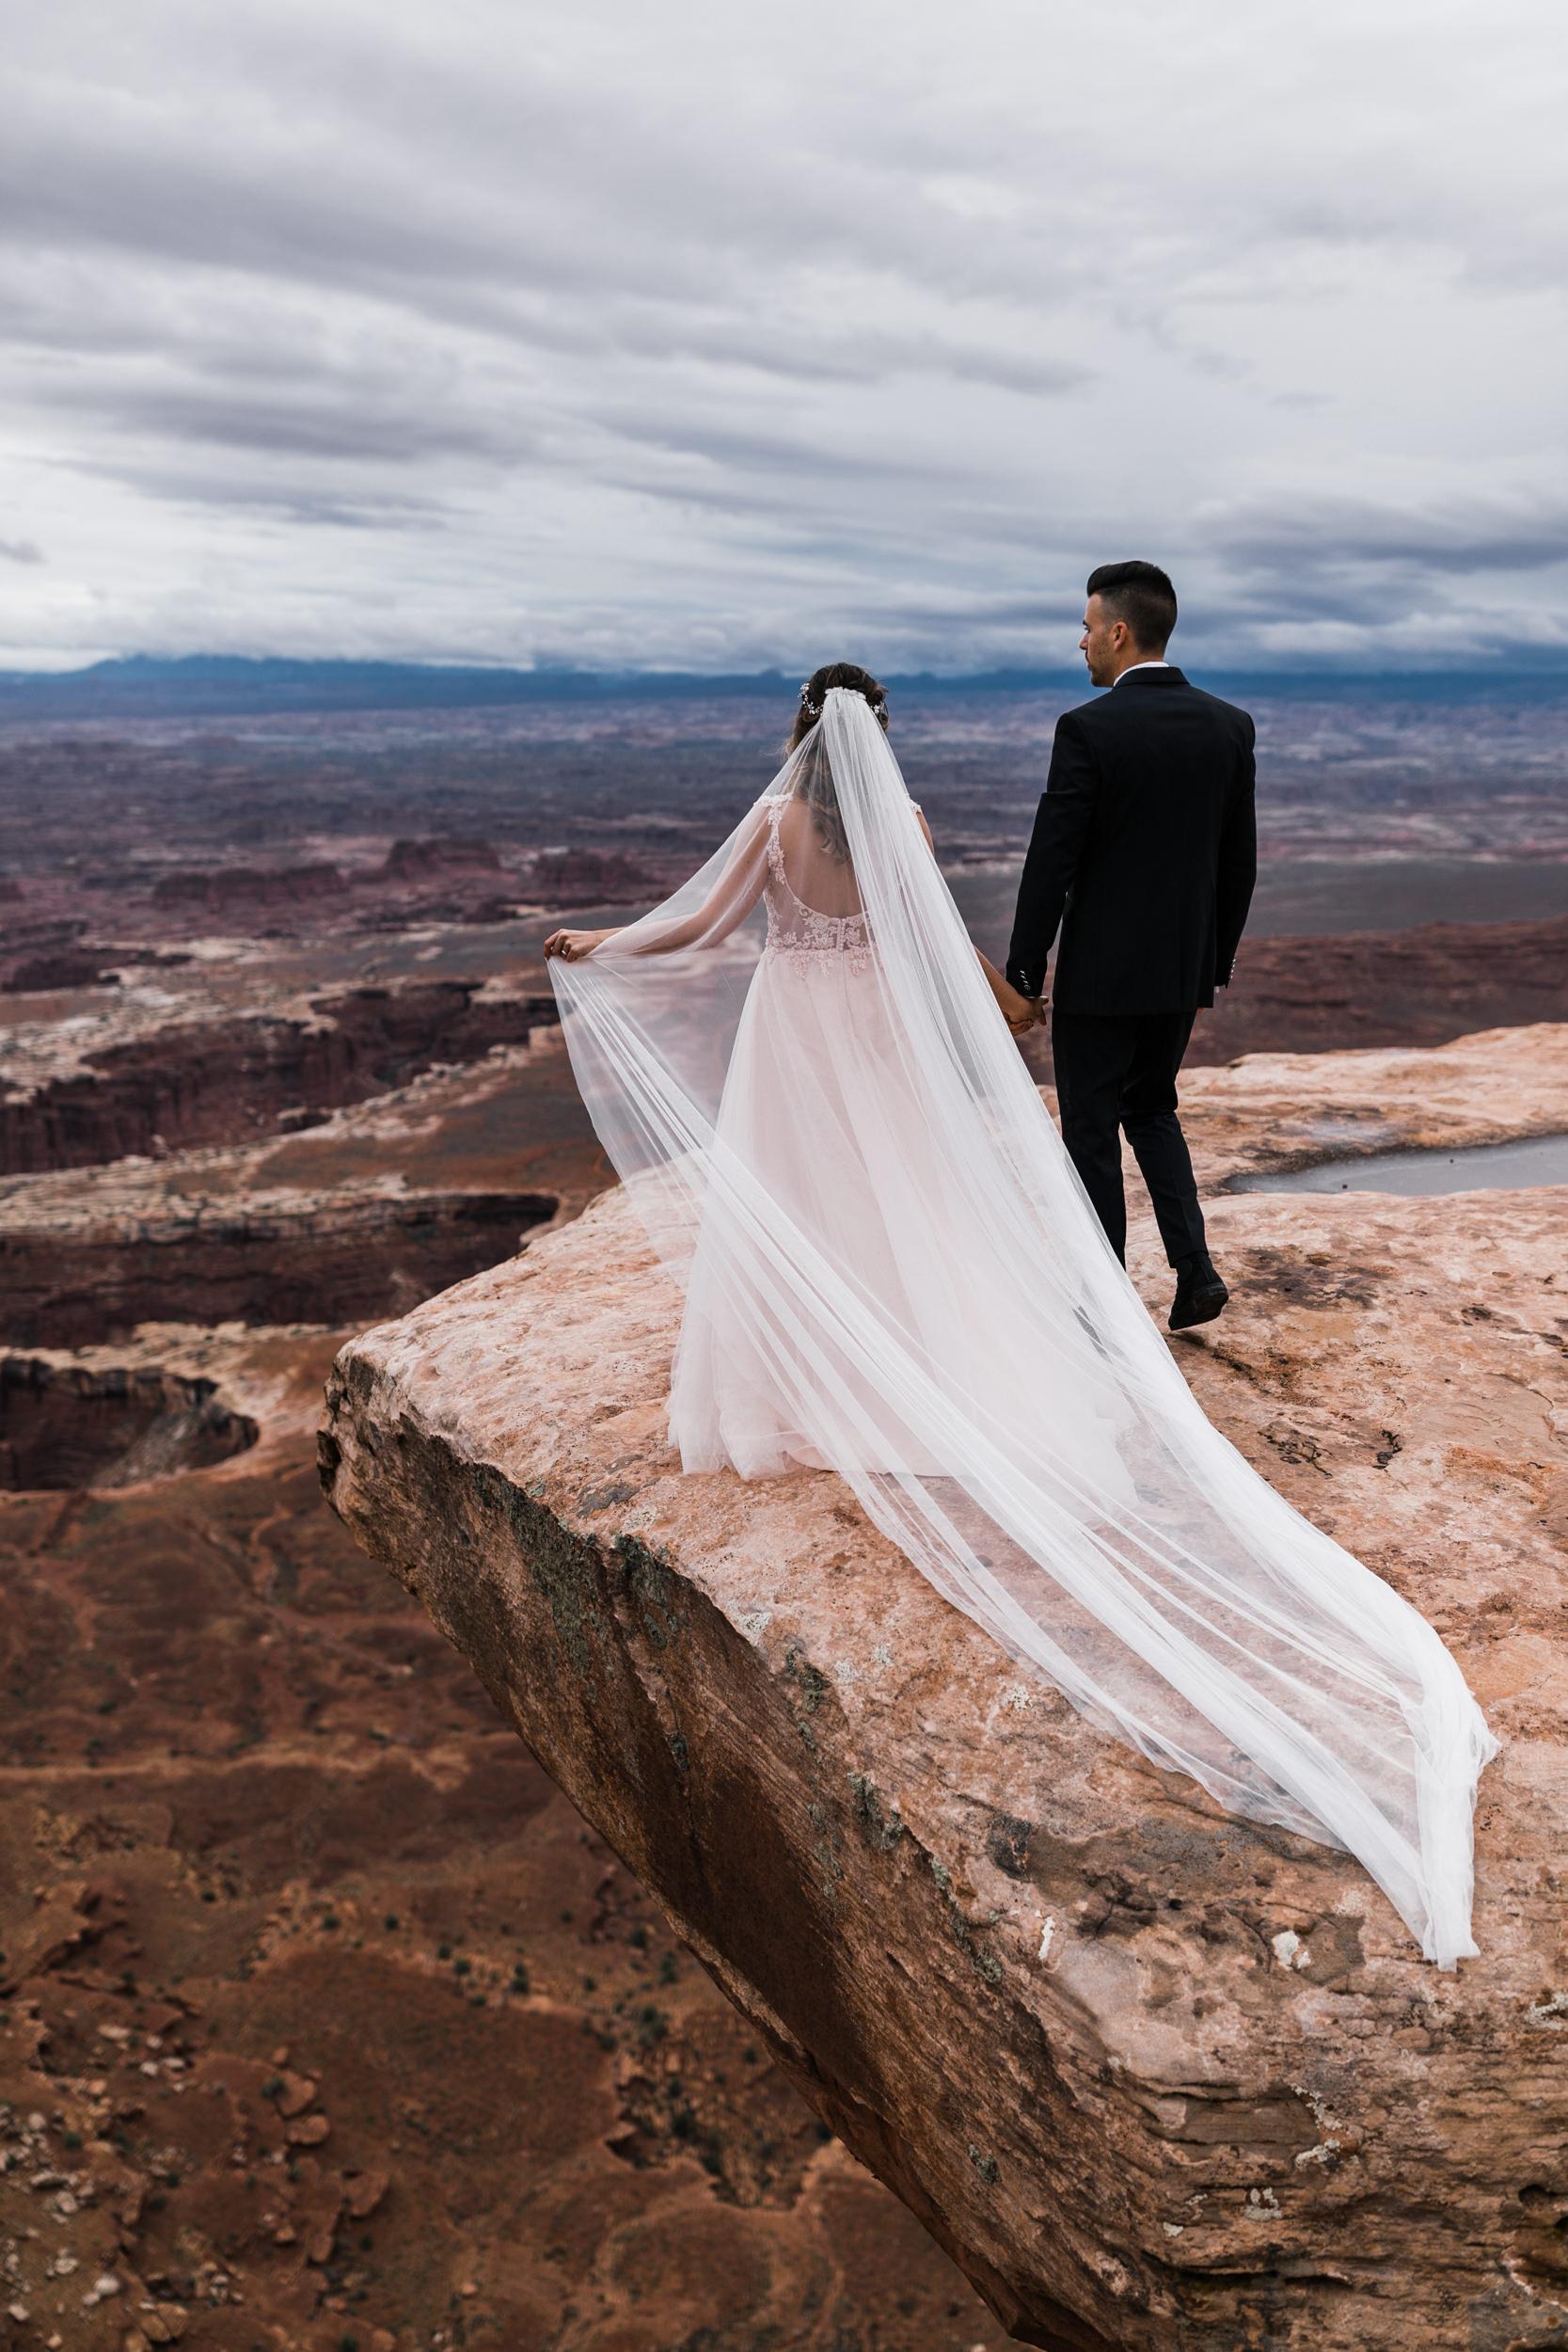 Hearnes-Elopement-Photography-Canyonlands-National-Park-Moab-Wedding-8.jpg